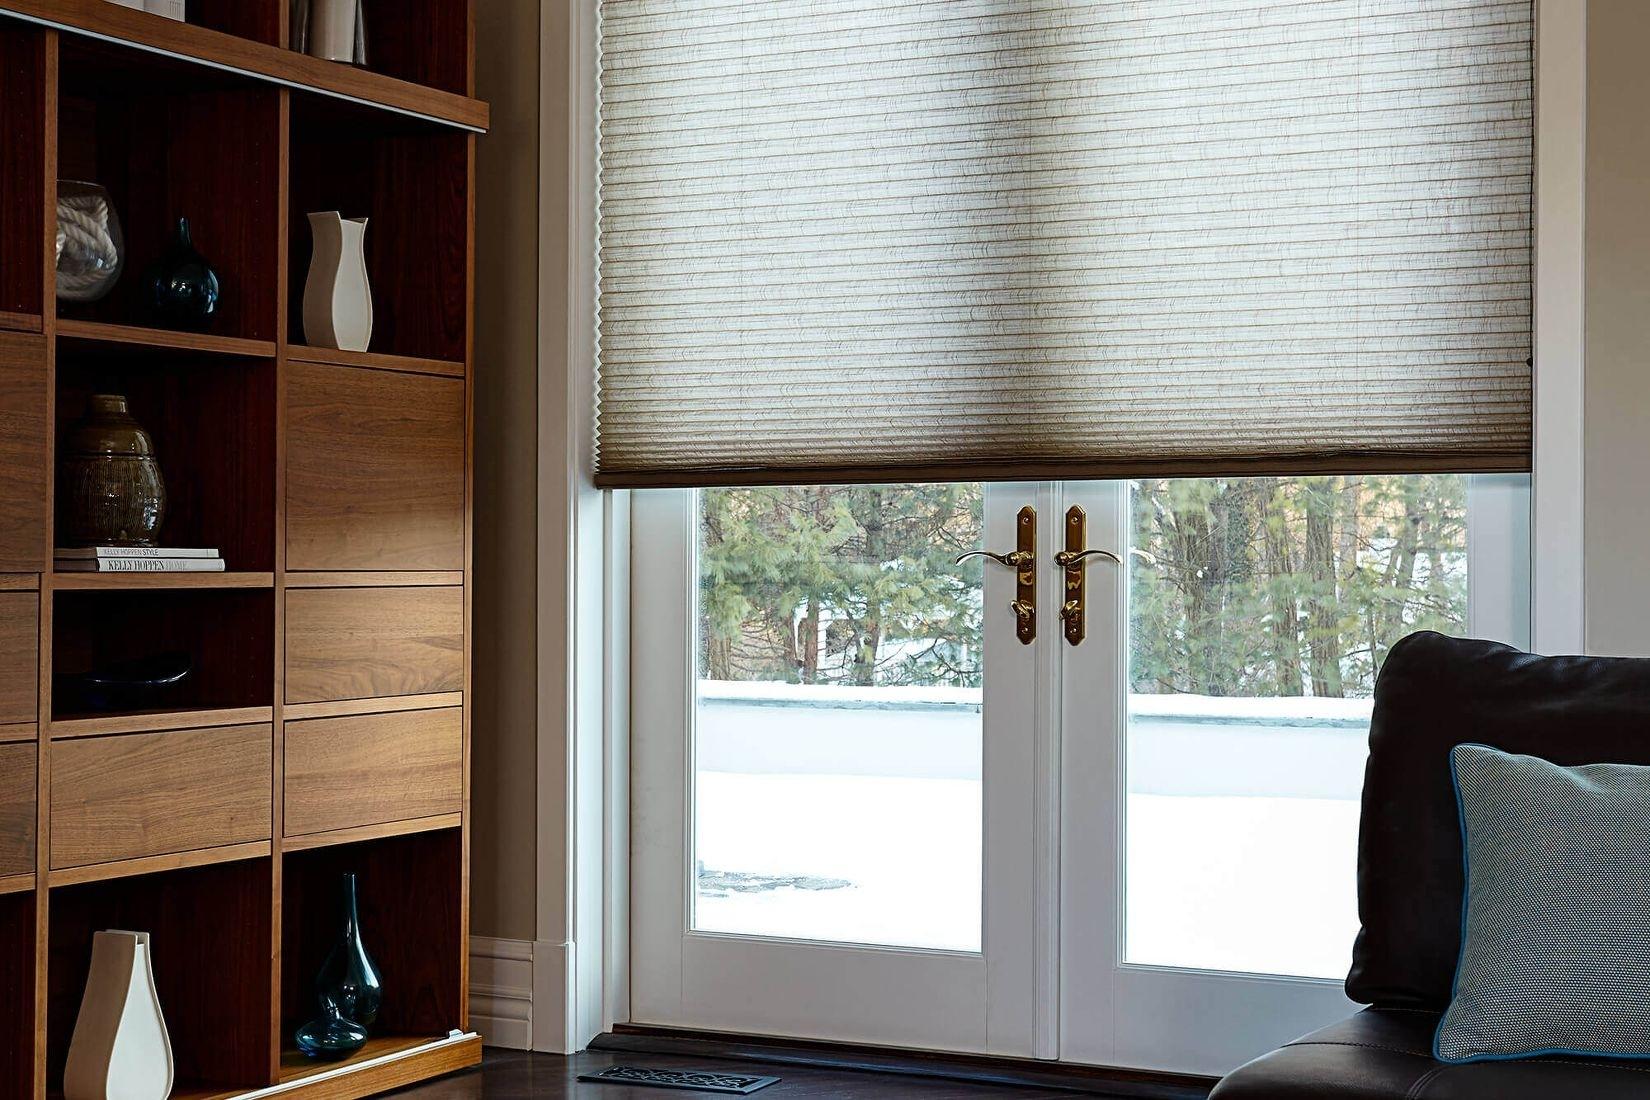 Cordless Cellular Shades For Sliding Glass DoorsCordless Cellular Shades For Sliding Glass Doors